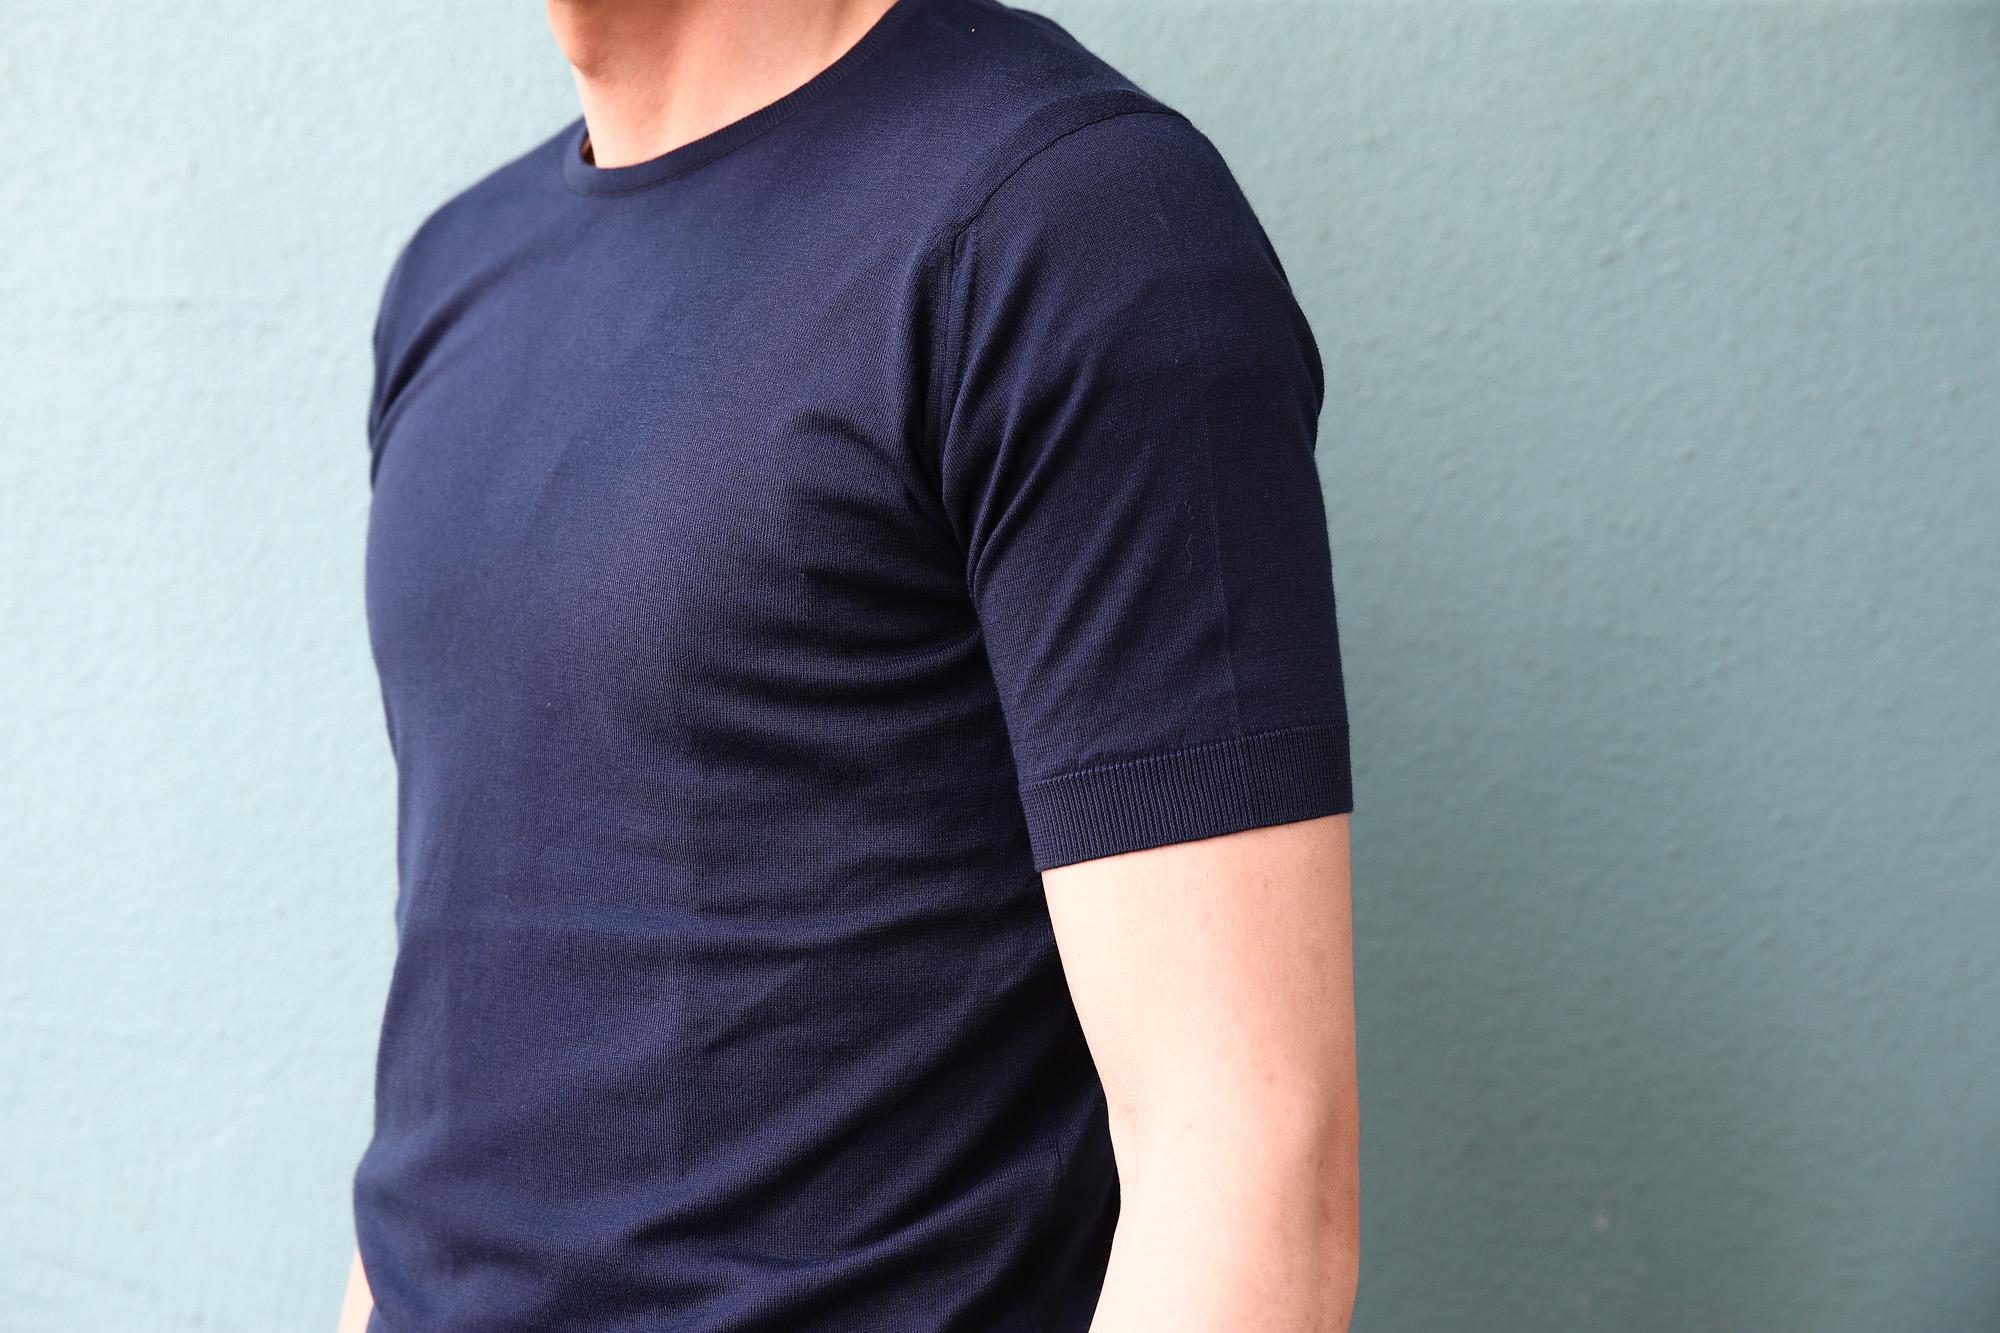 JOHN SMEDLEY (ジョンスメドレー) BELDEN (ベルデン) SEA ISLAND COTTON (シーアイランドコットン) ショートスリーブ コットンニット Tシャツ NAVY (ネイビー) Made in England (イギリス製) 2018 春夏新作 johnsmedley スメドレー 愛知 名古屋 Alto e Diritto アルト エ デリット